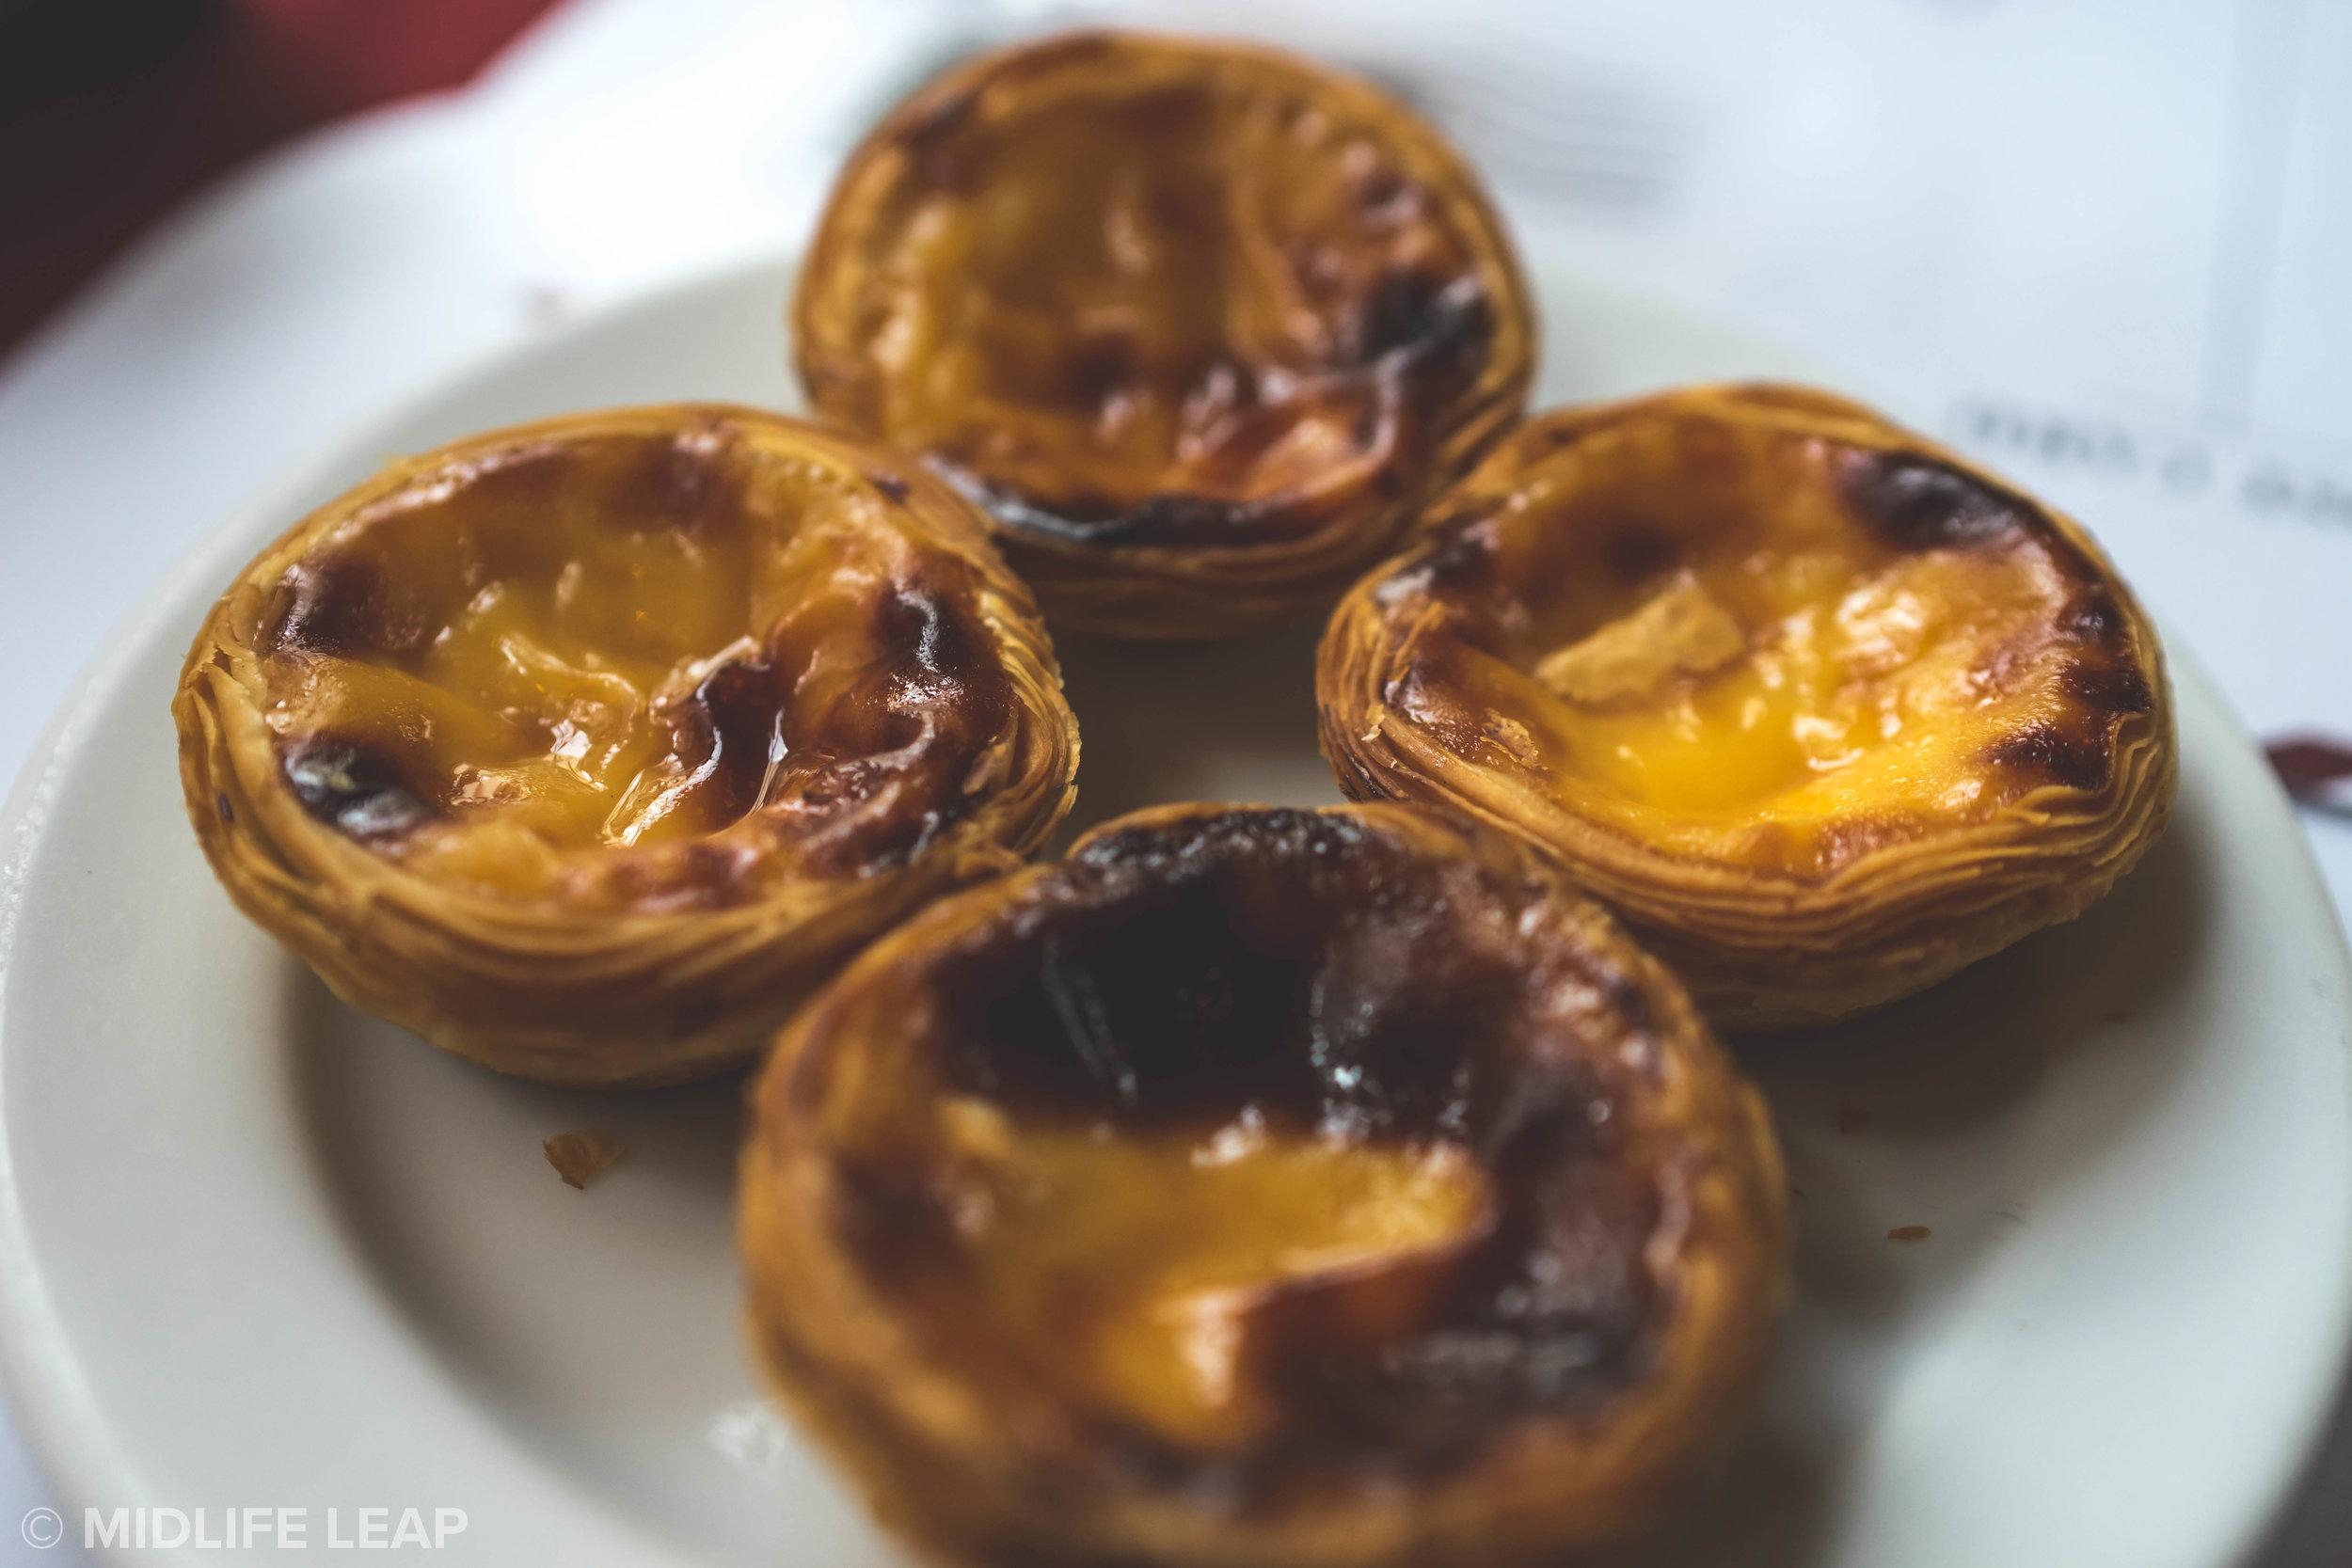 confeitaria-nacional-best-pasteis-de-natas-in-lisbon